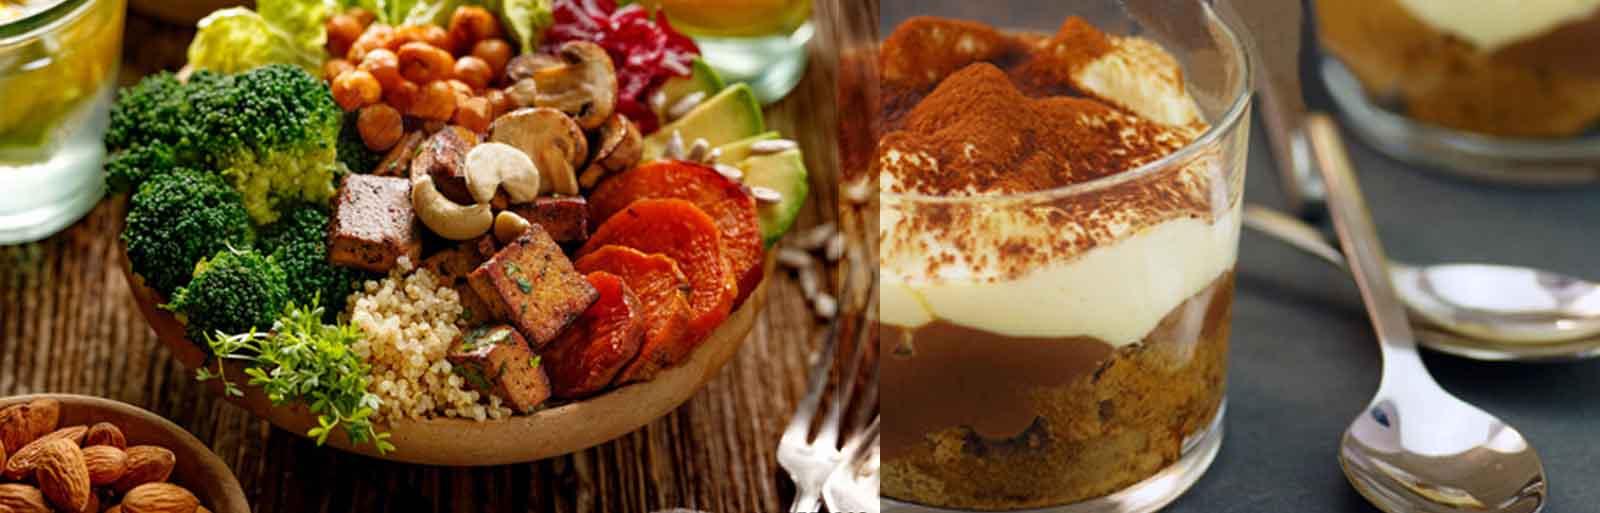 vegan-et-tiramisu-maiso-restaurant-la-couvertoirade